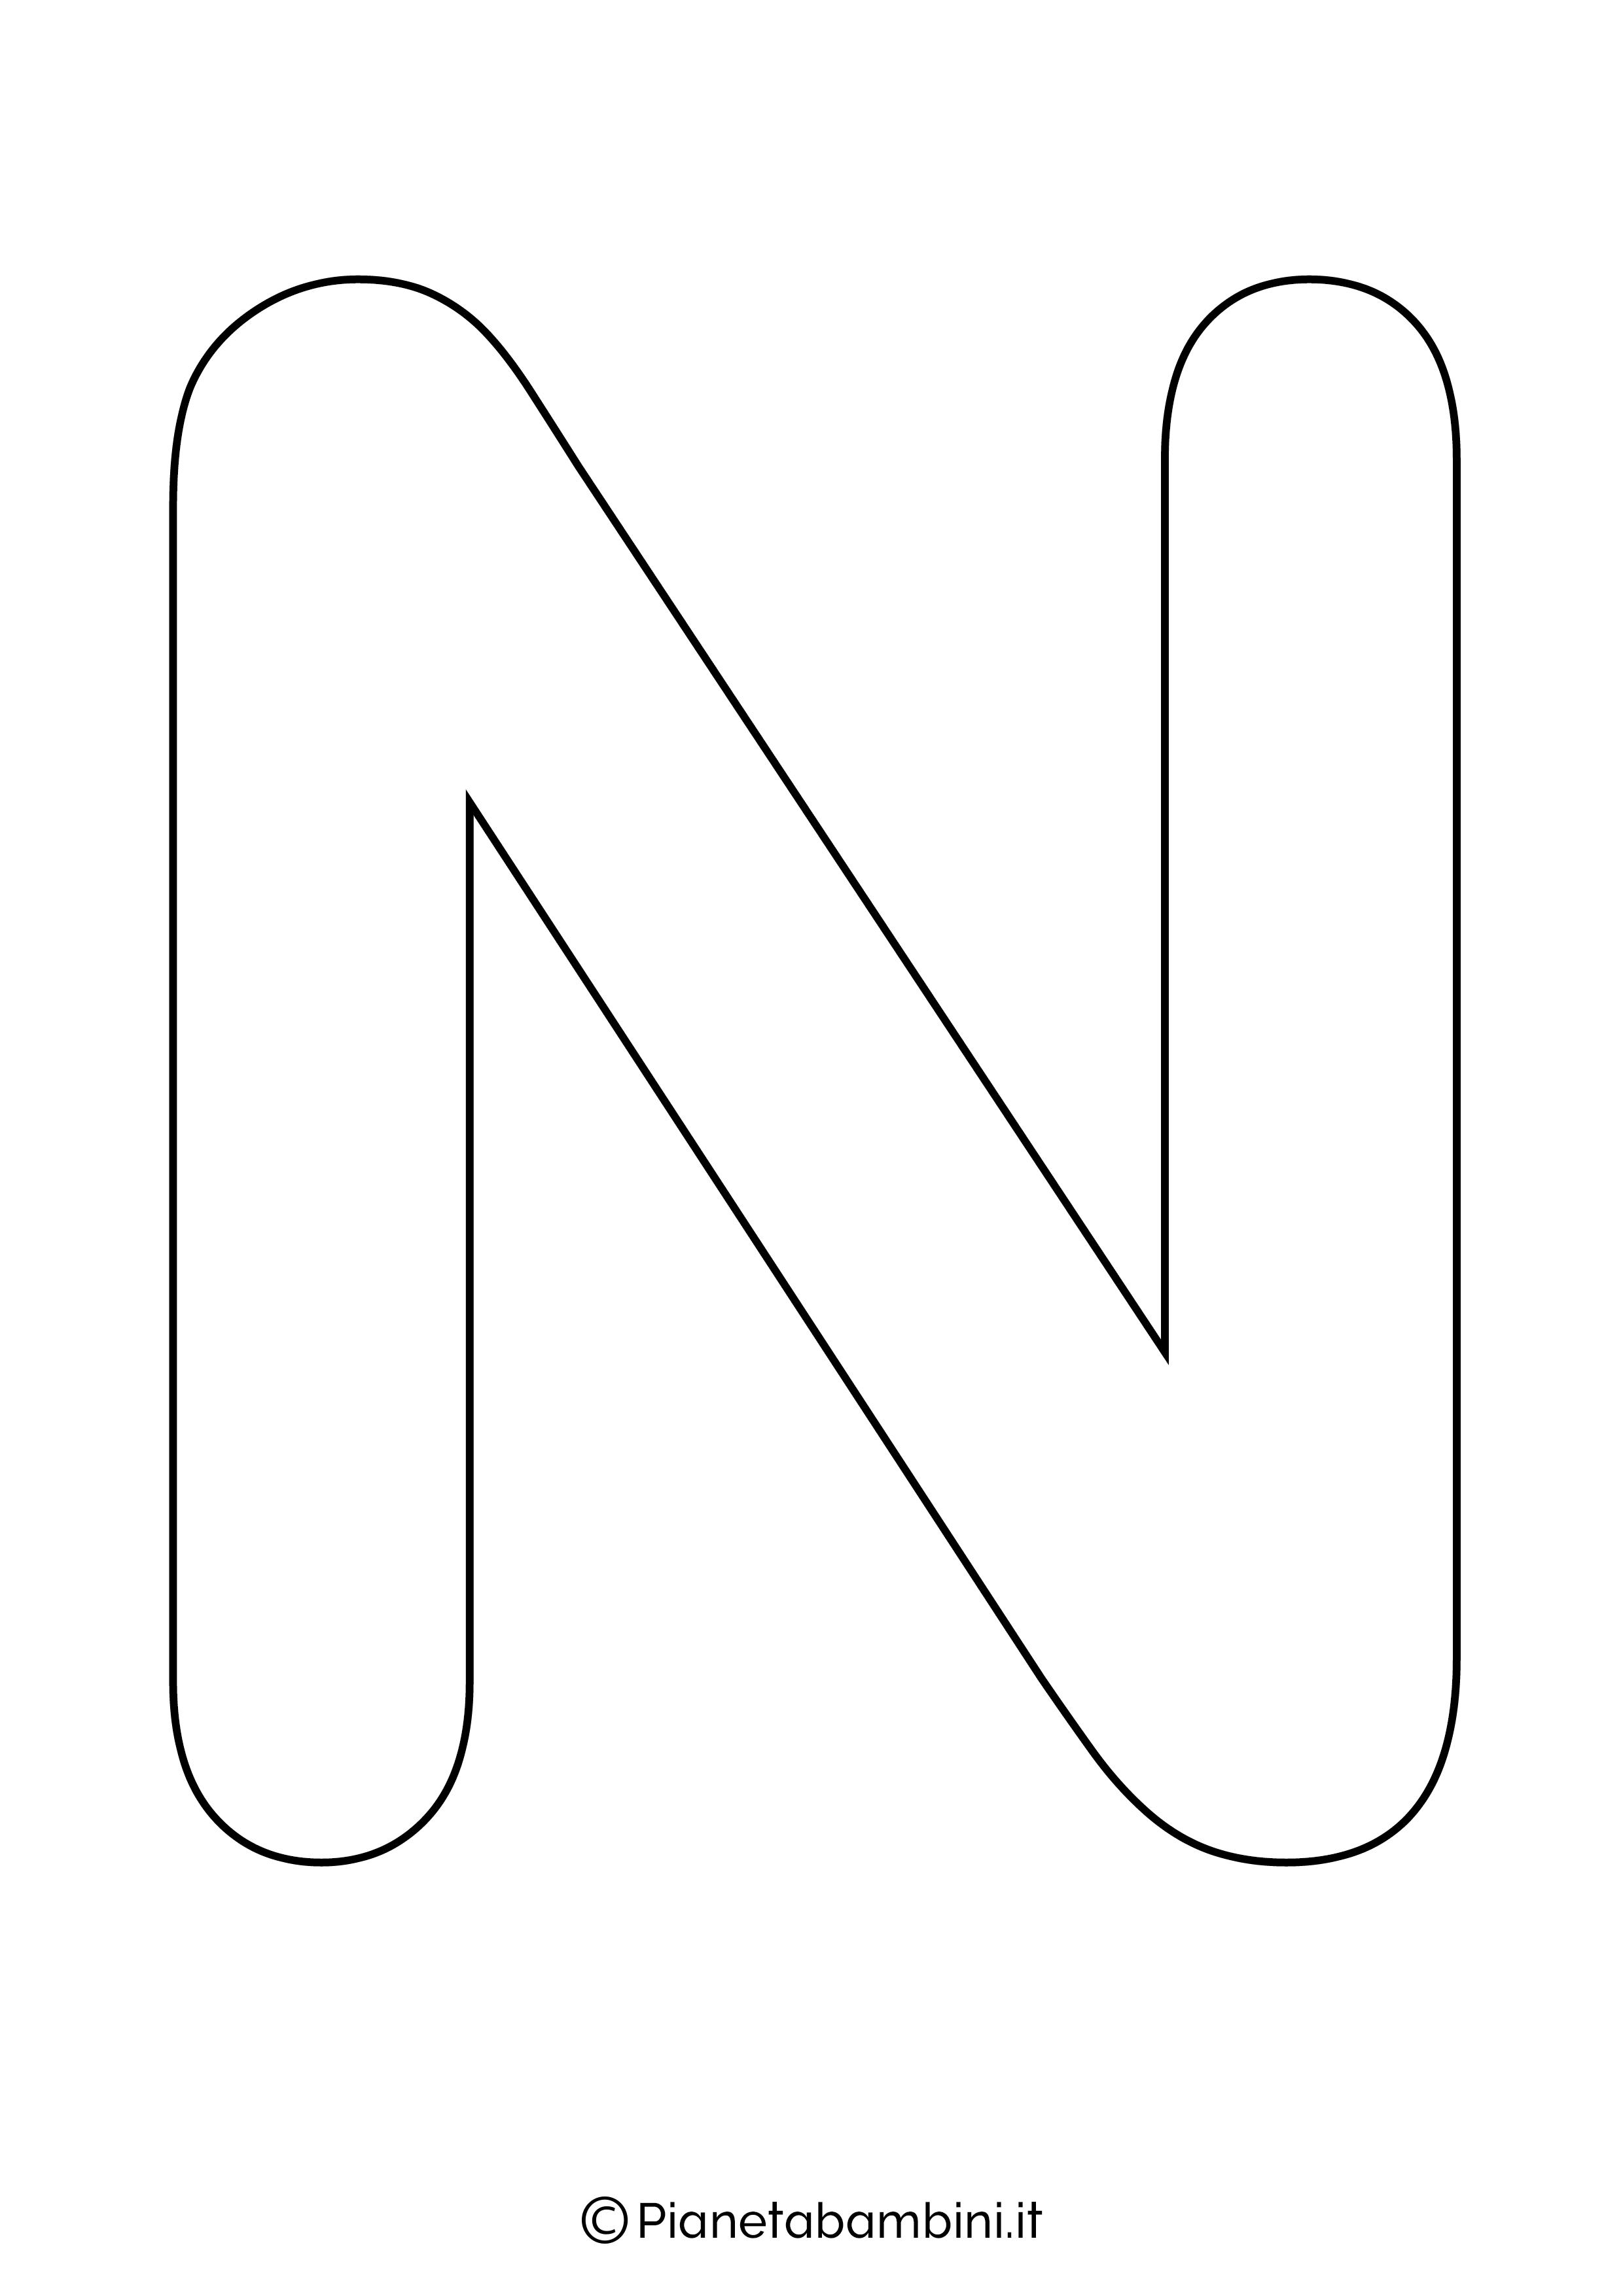 Lettera N maiuscola da stampare